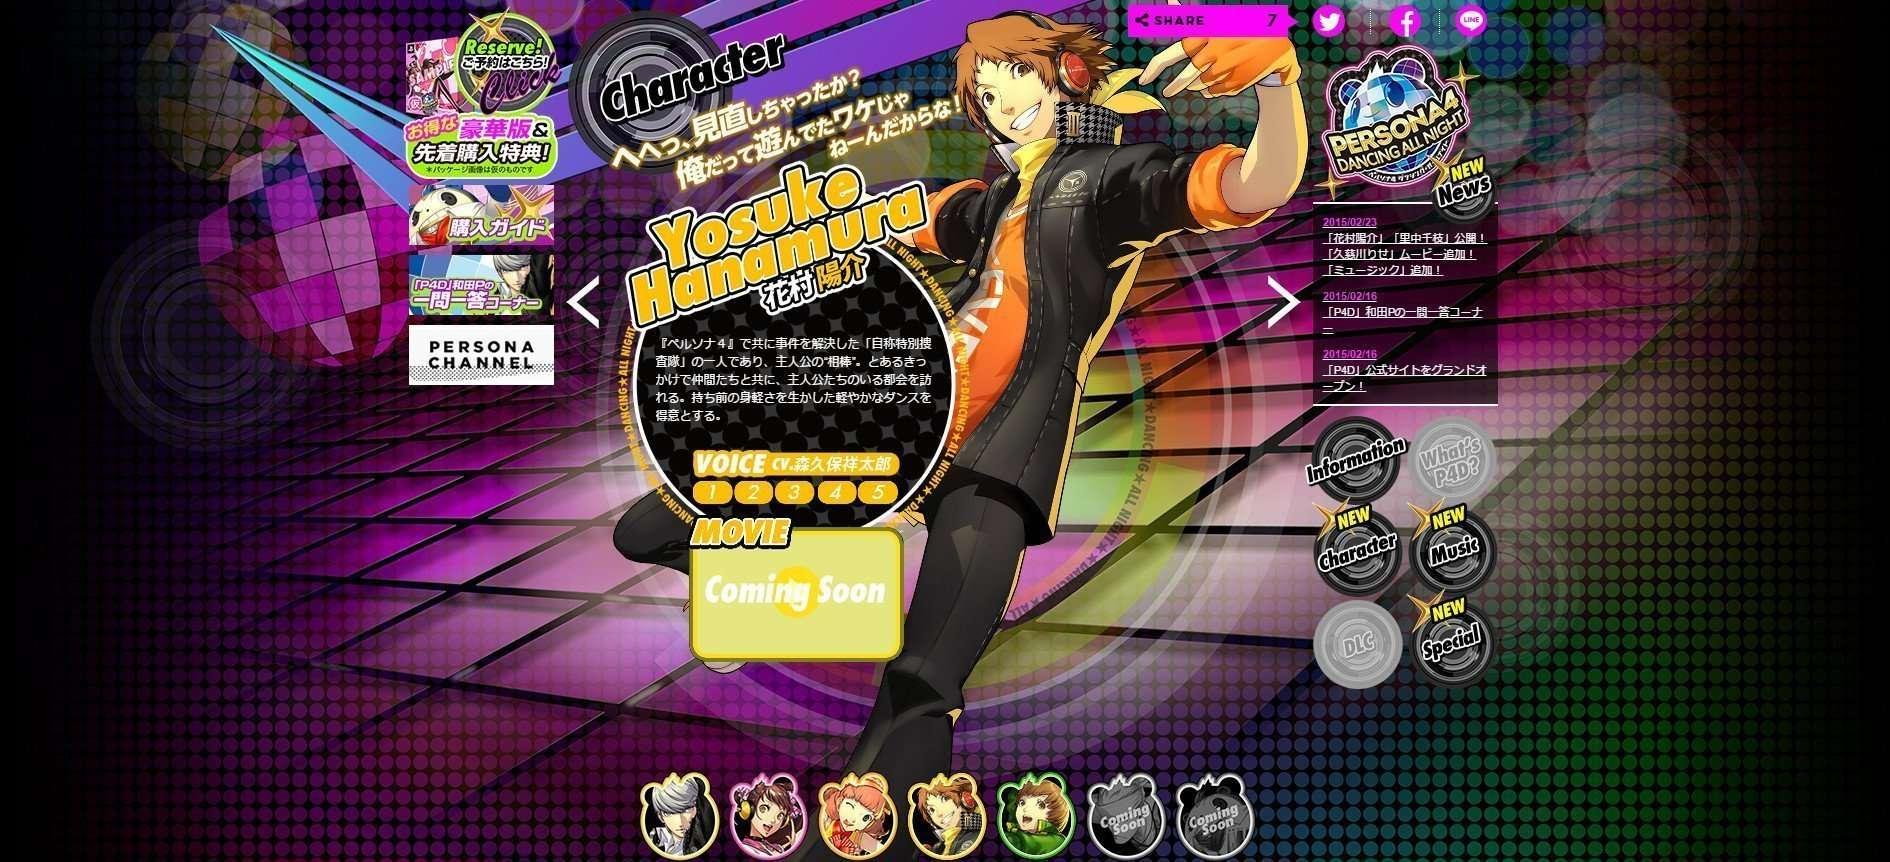 P4D Character Yosuke